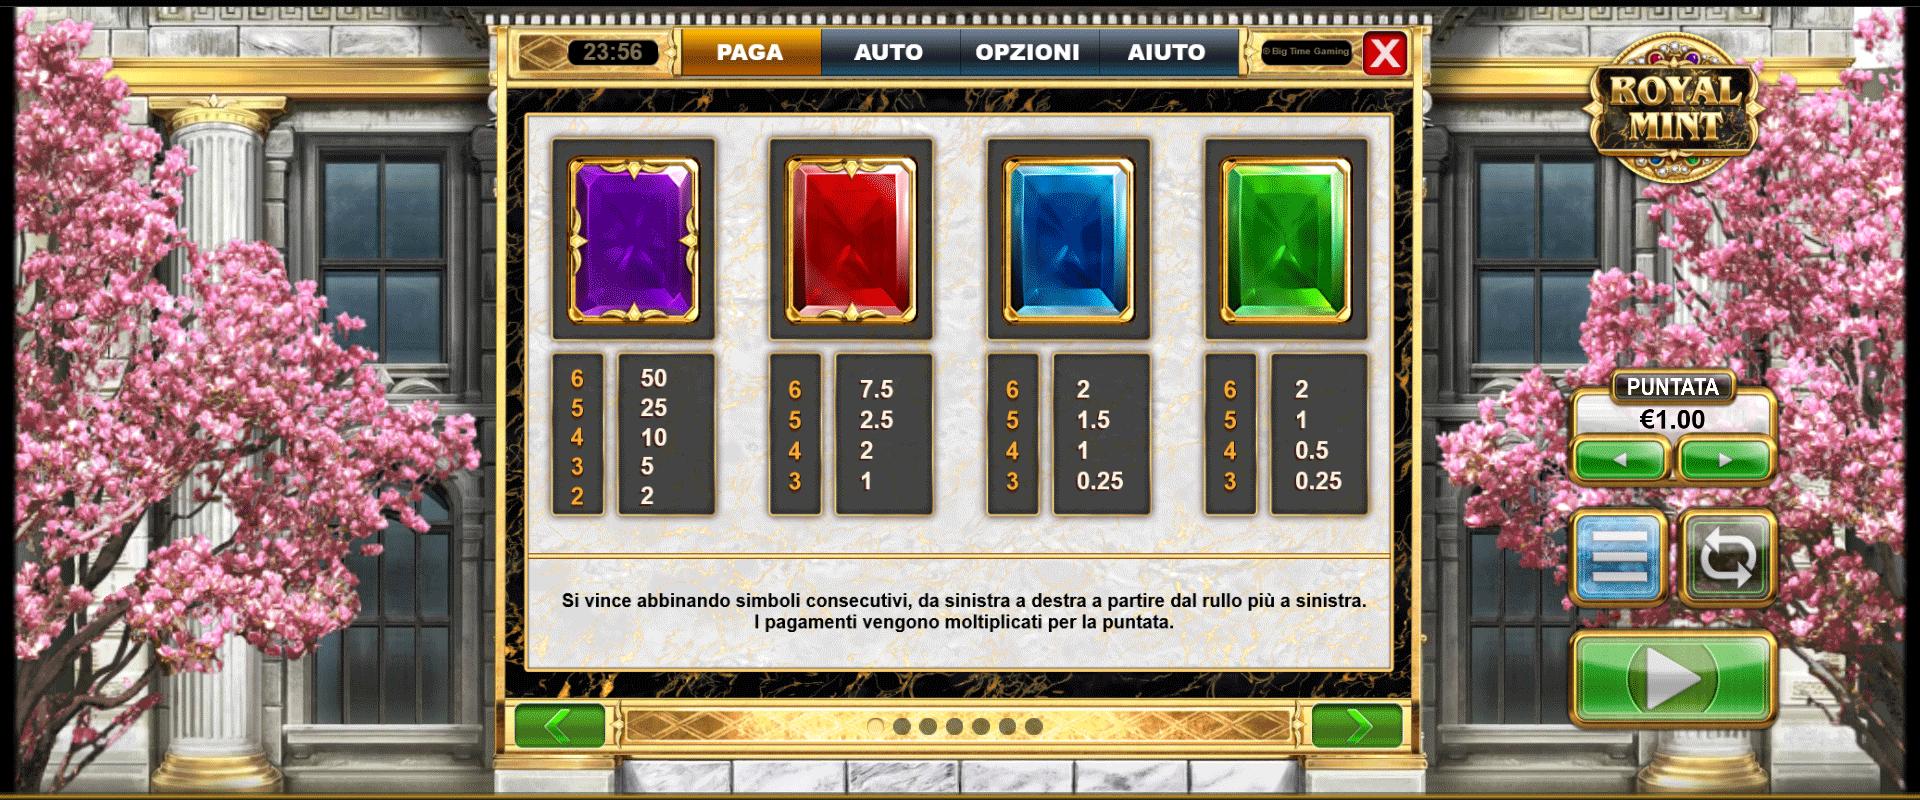 tabella dei pagamenti della slot online royal mint megaways